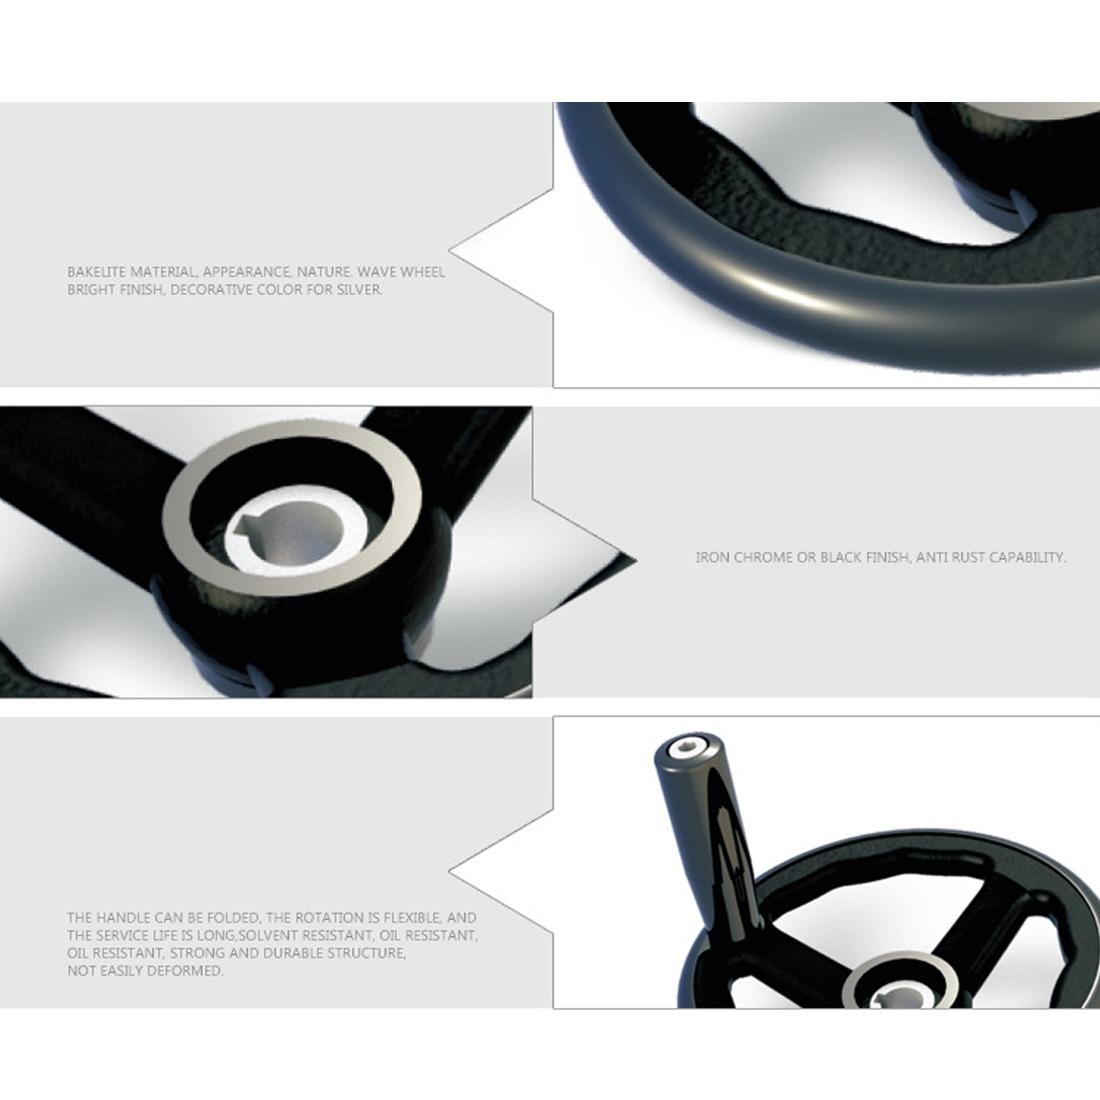 250 /× 25mm 3 Spoked Milling Hand Wheel Bakelite Plastic Insulation Lathe Handwheel Anti-Slip with Handle for Machine Tool Hand Wheel